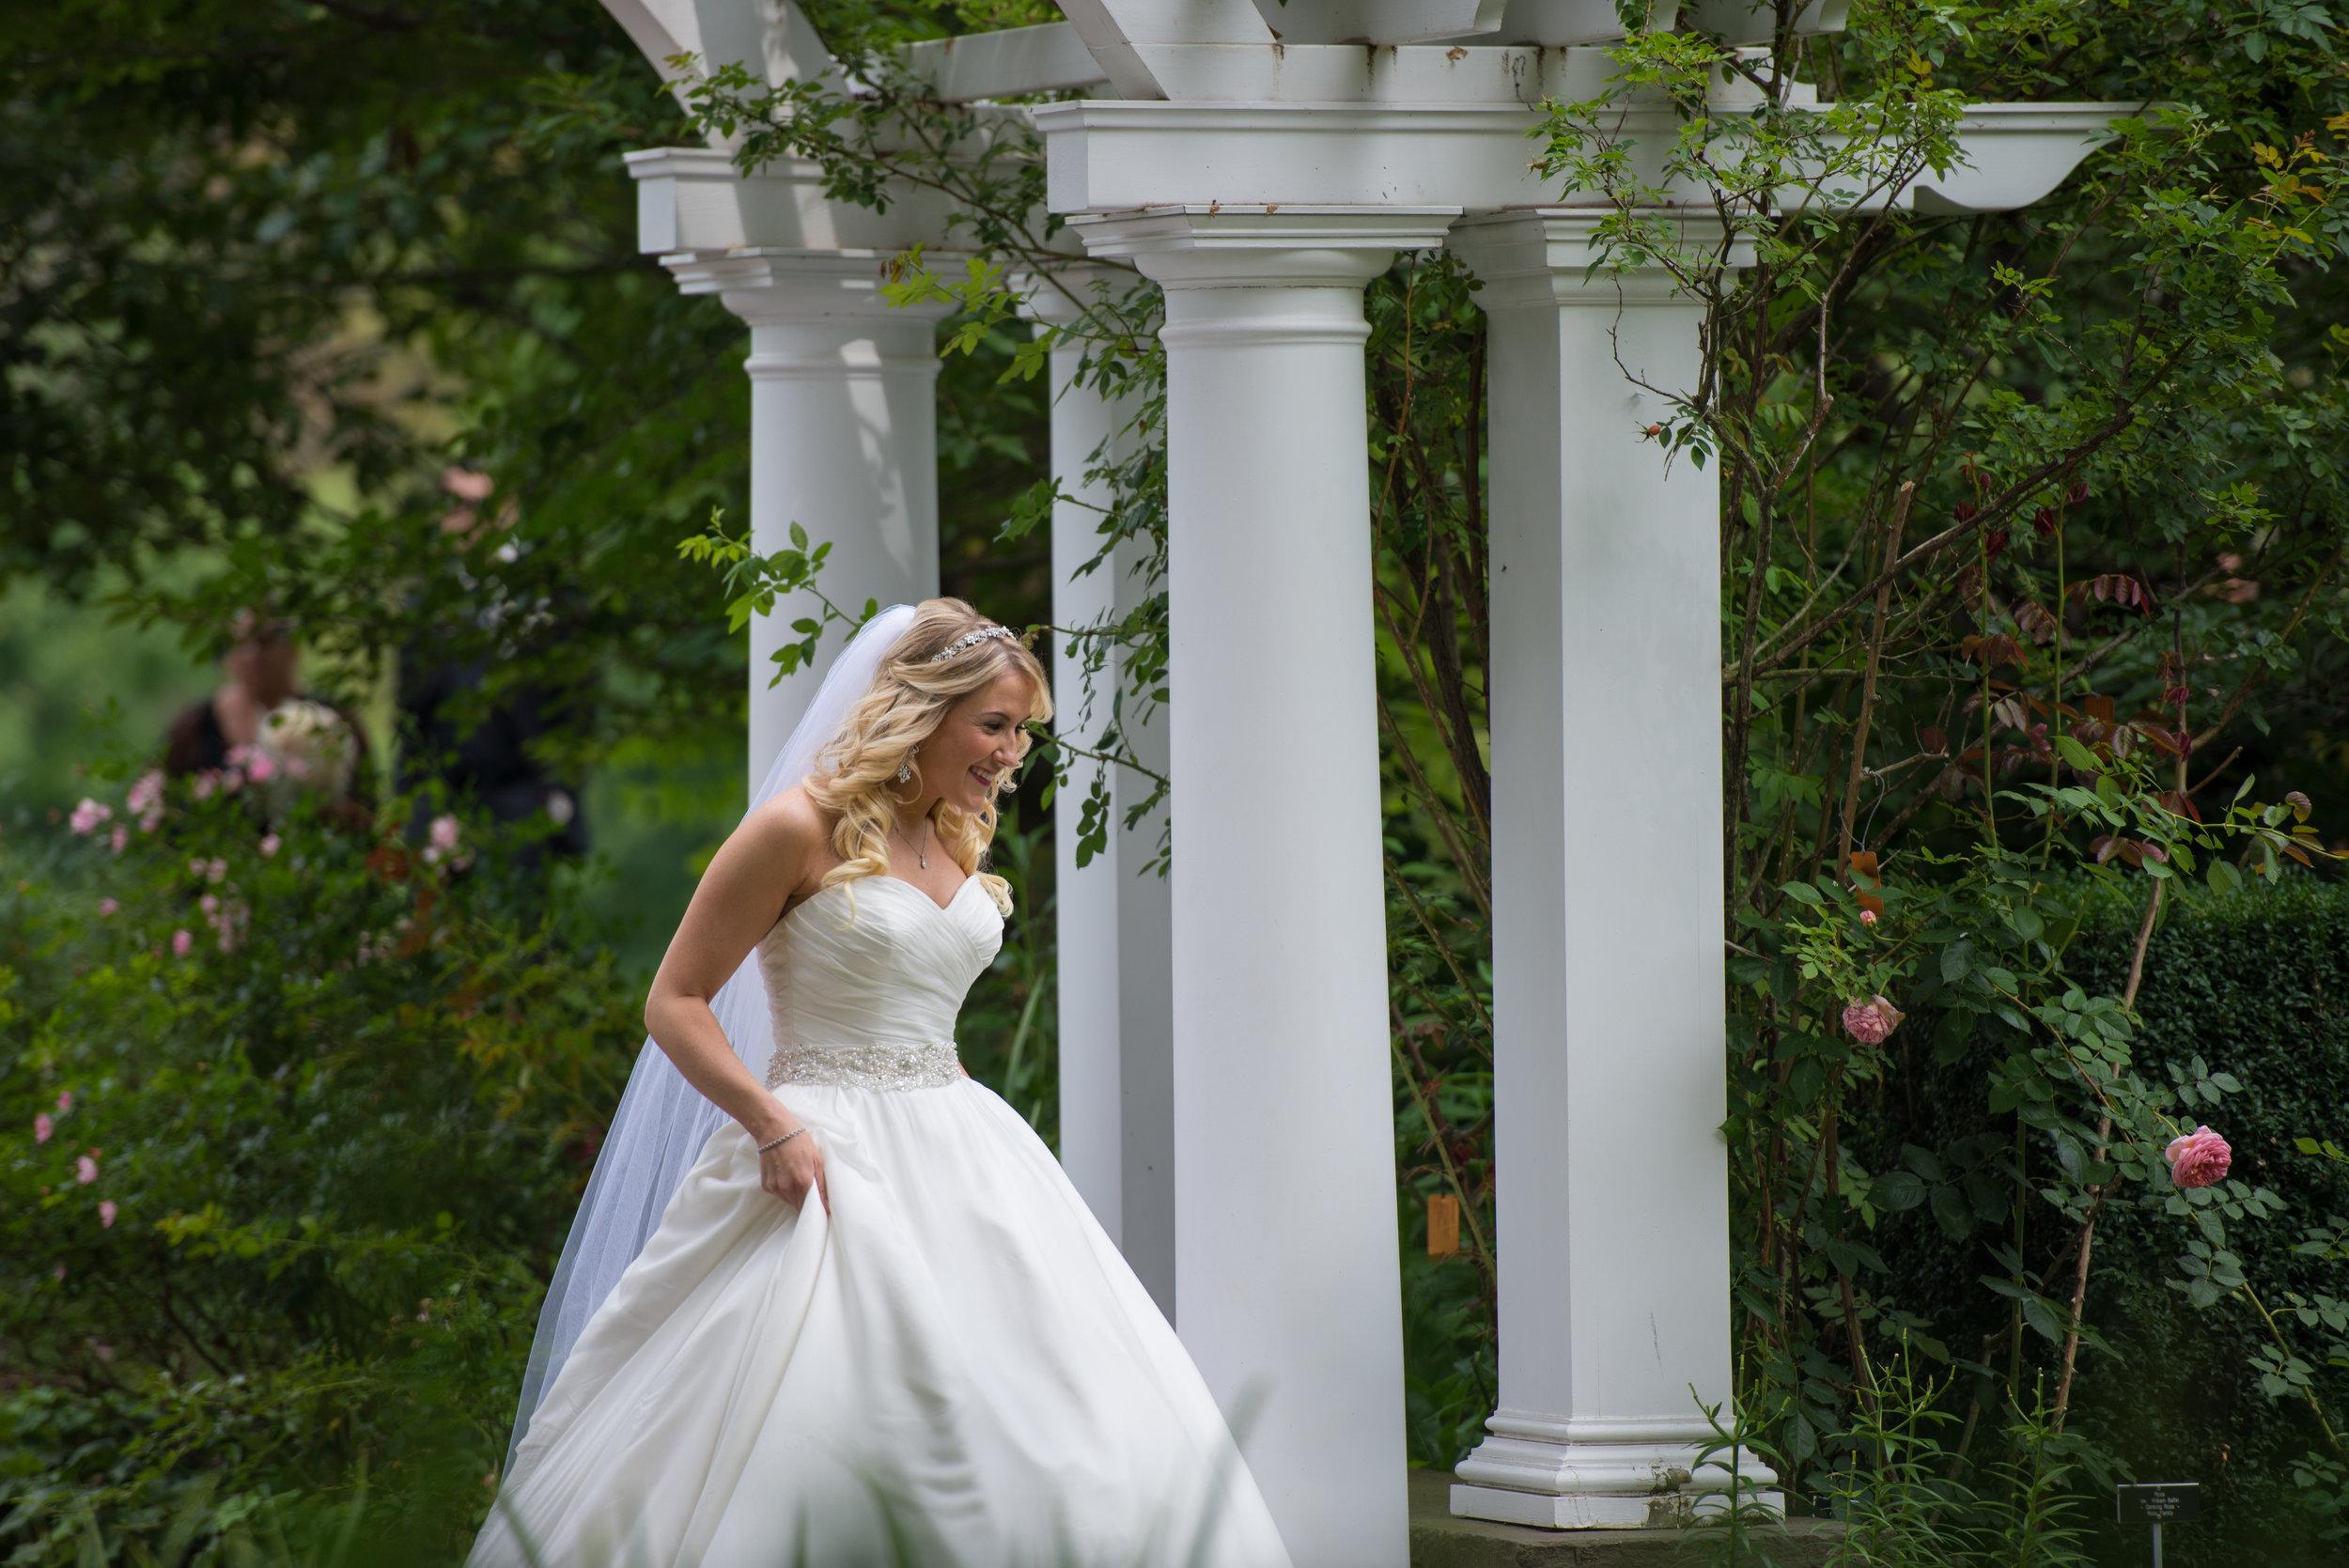 Wedding First Look Photos00912.jpg